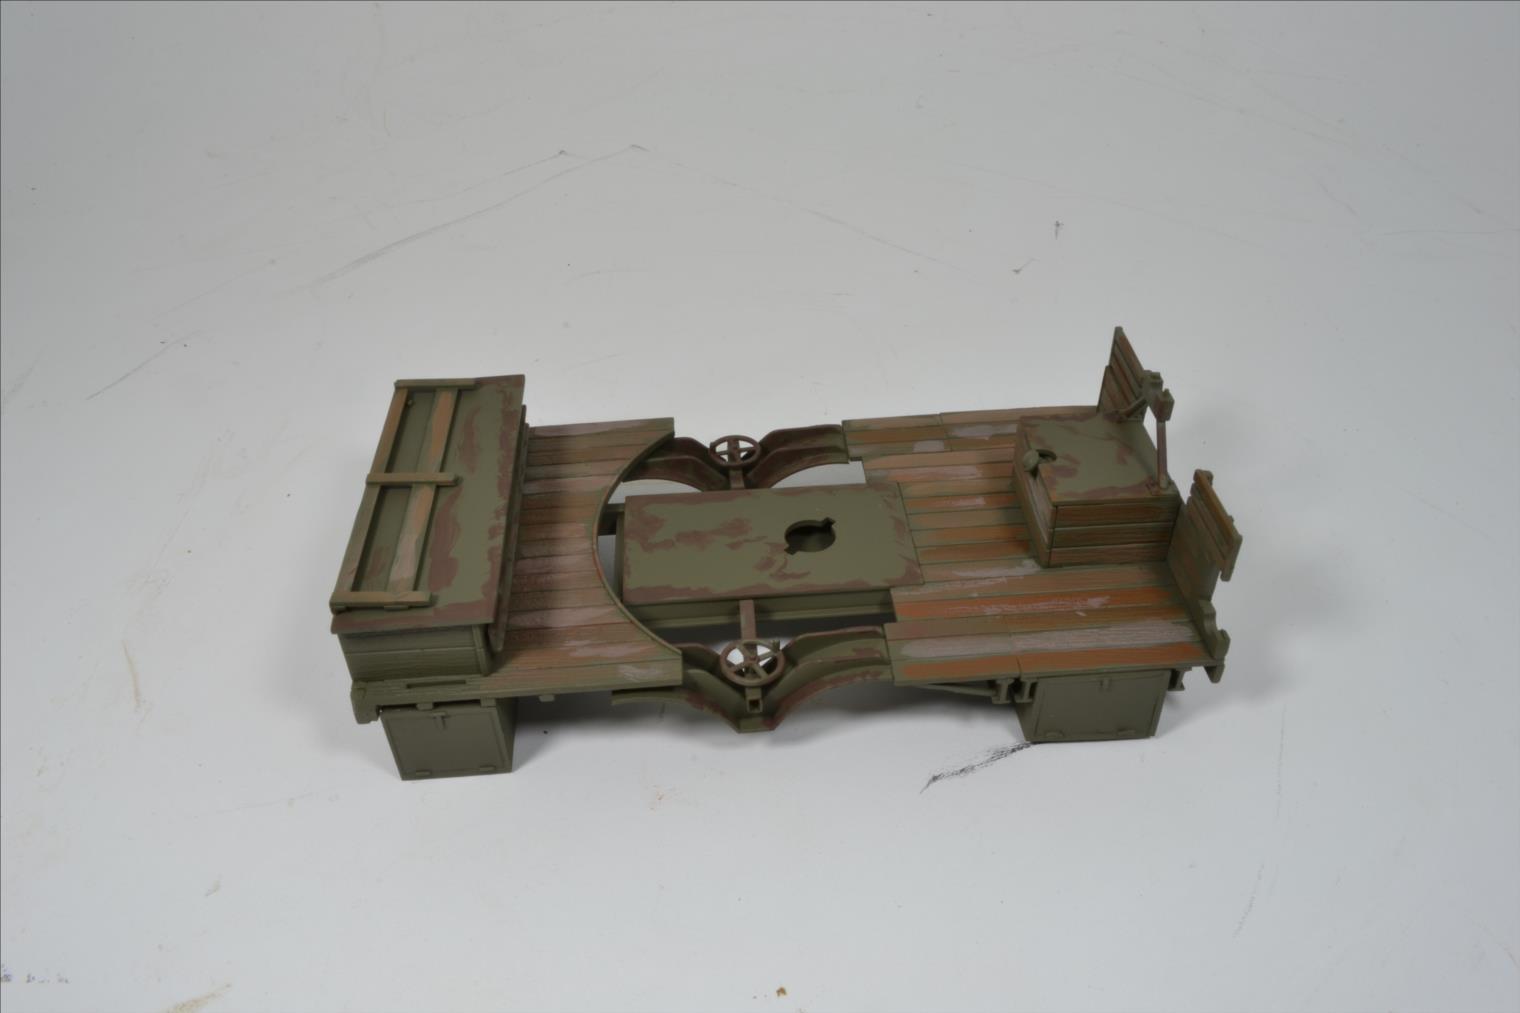 INDOCHINE GMC Bofors (Hobby Boss) 1/35 - Page 2 19120809054422494216547033